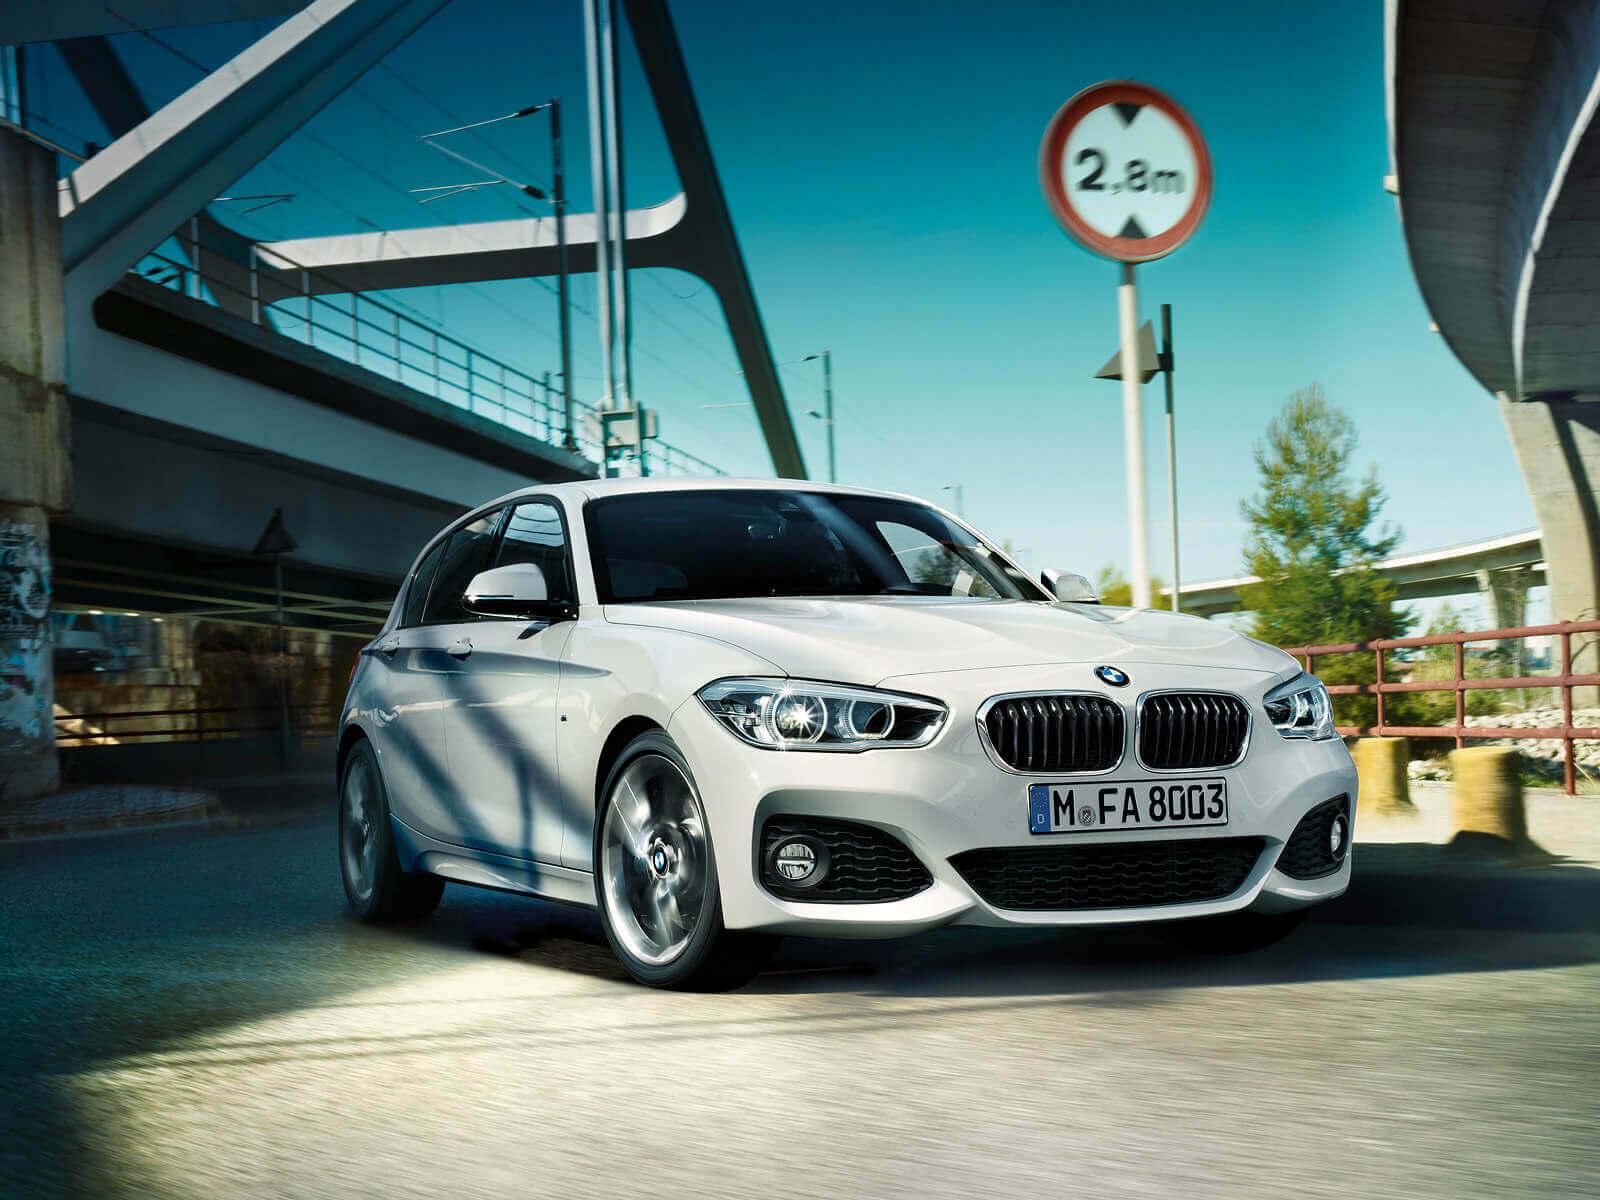 BMW 1 серии, защита, угон, авто, кража